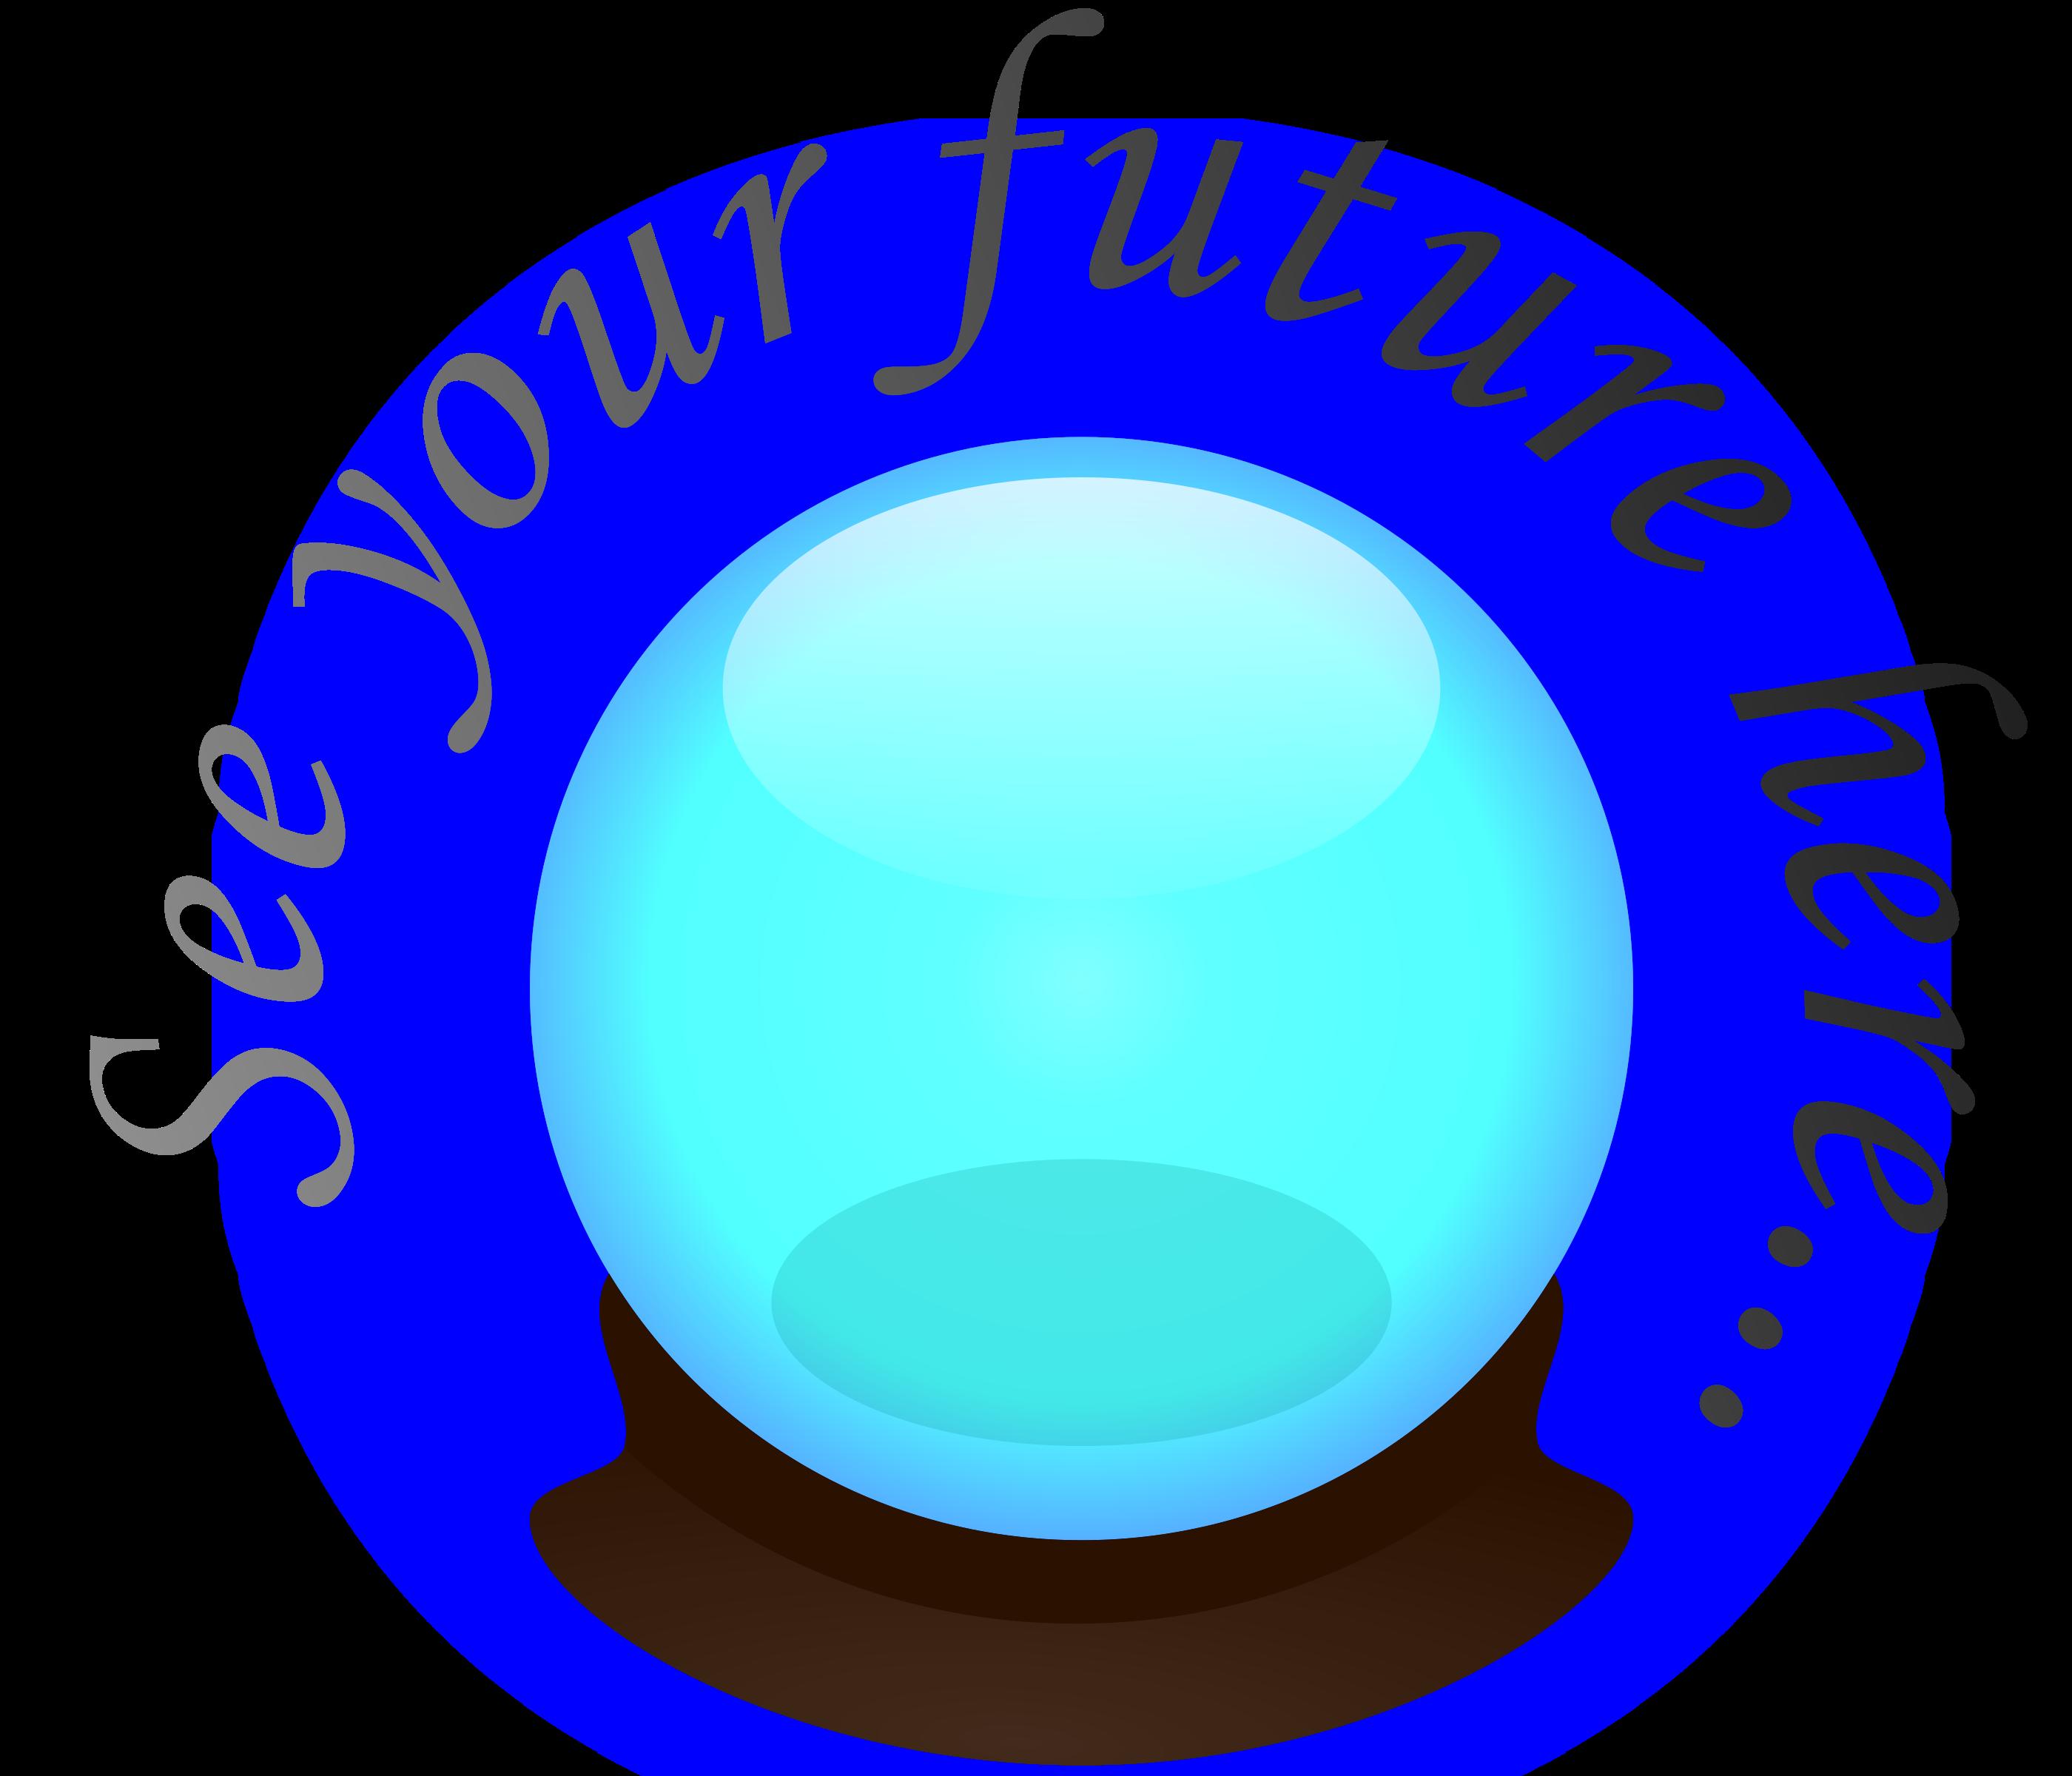 banner transparent Crystal clipart. Ball big image png